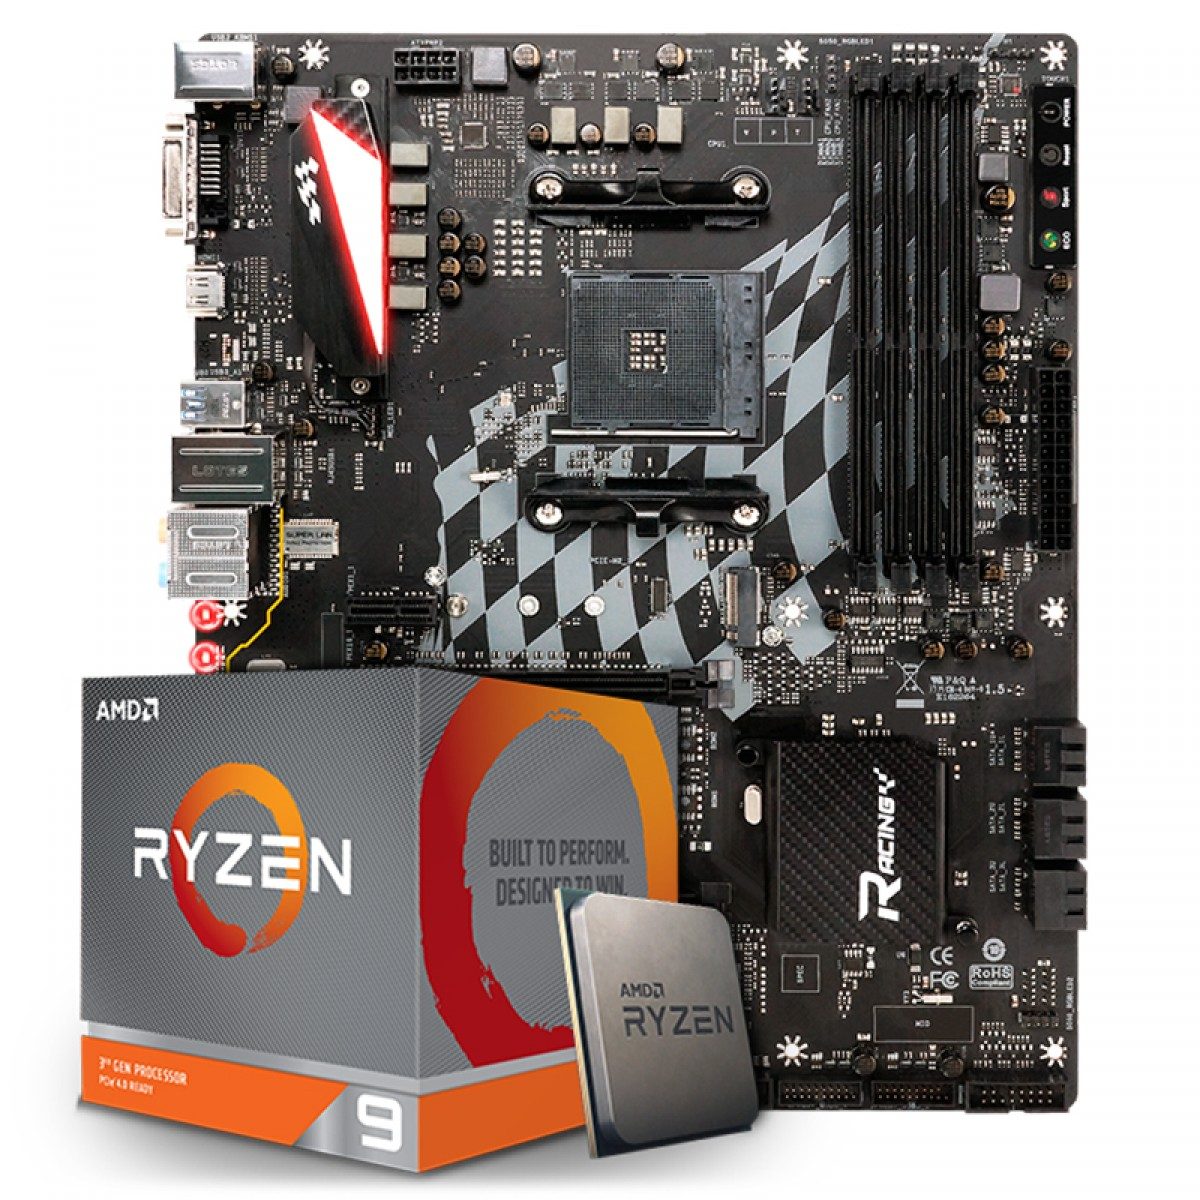 Kit Upgrade Placa Mãe Biostar Racing X470GTA + Processador AMD Ryzen 9 3900x 3.8GHz